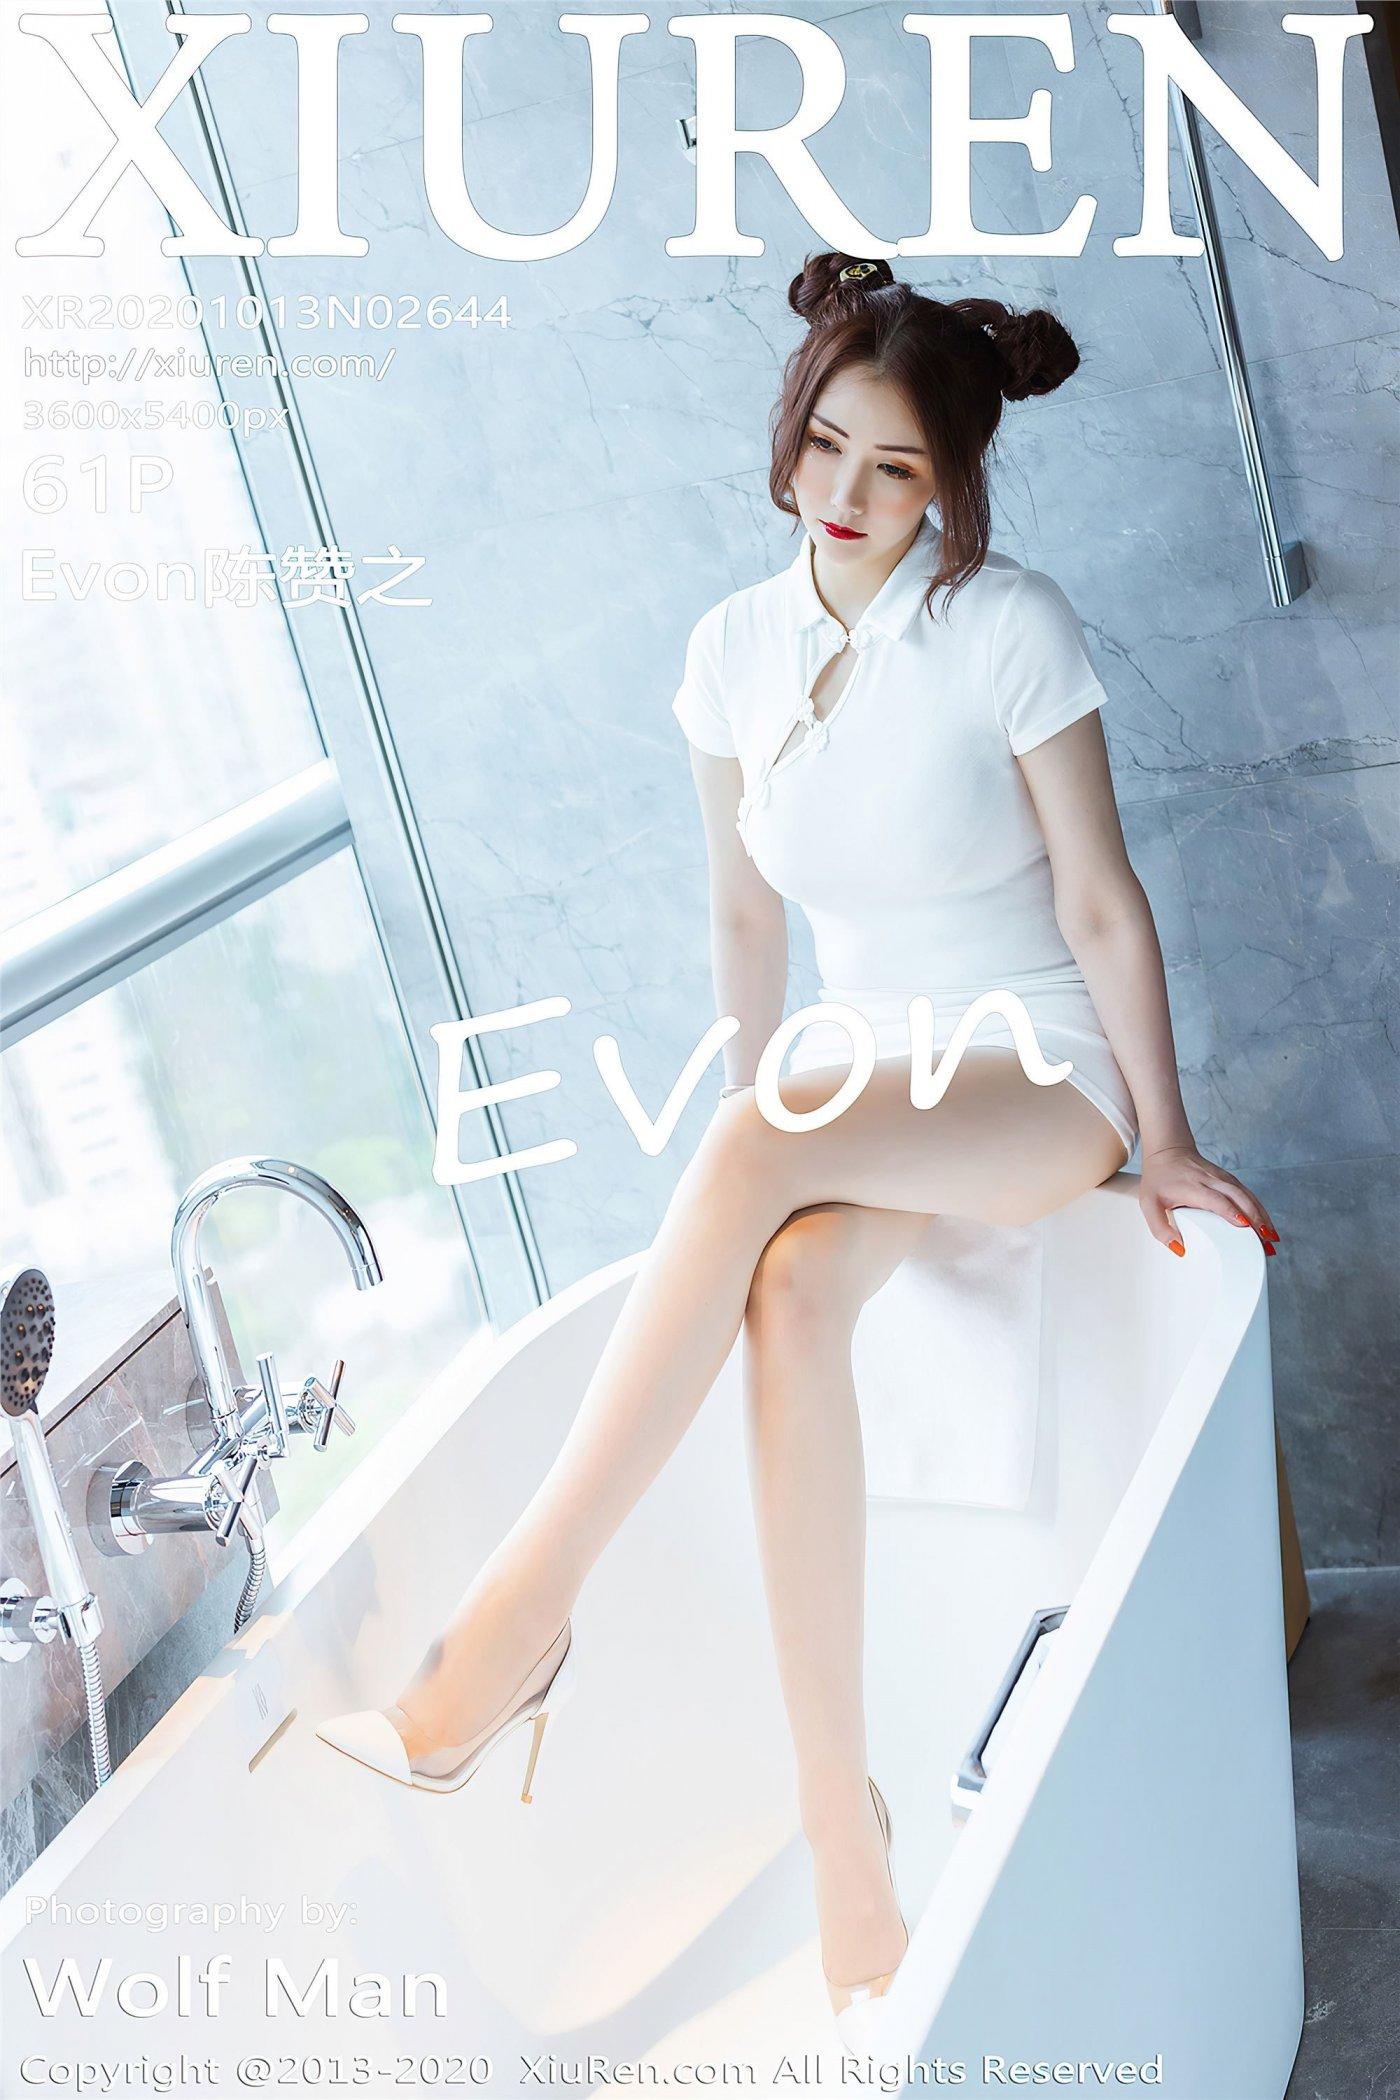 Evon陈赞之(Vol. 2644) 性感mm-第1张